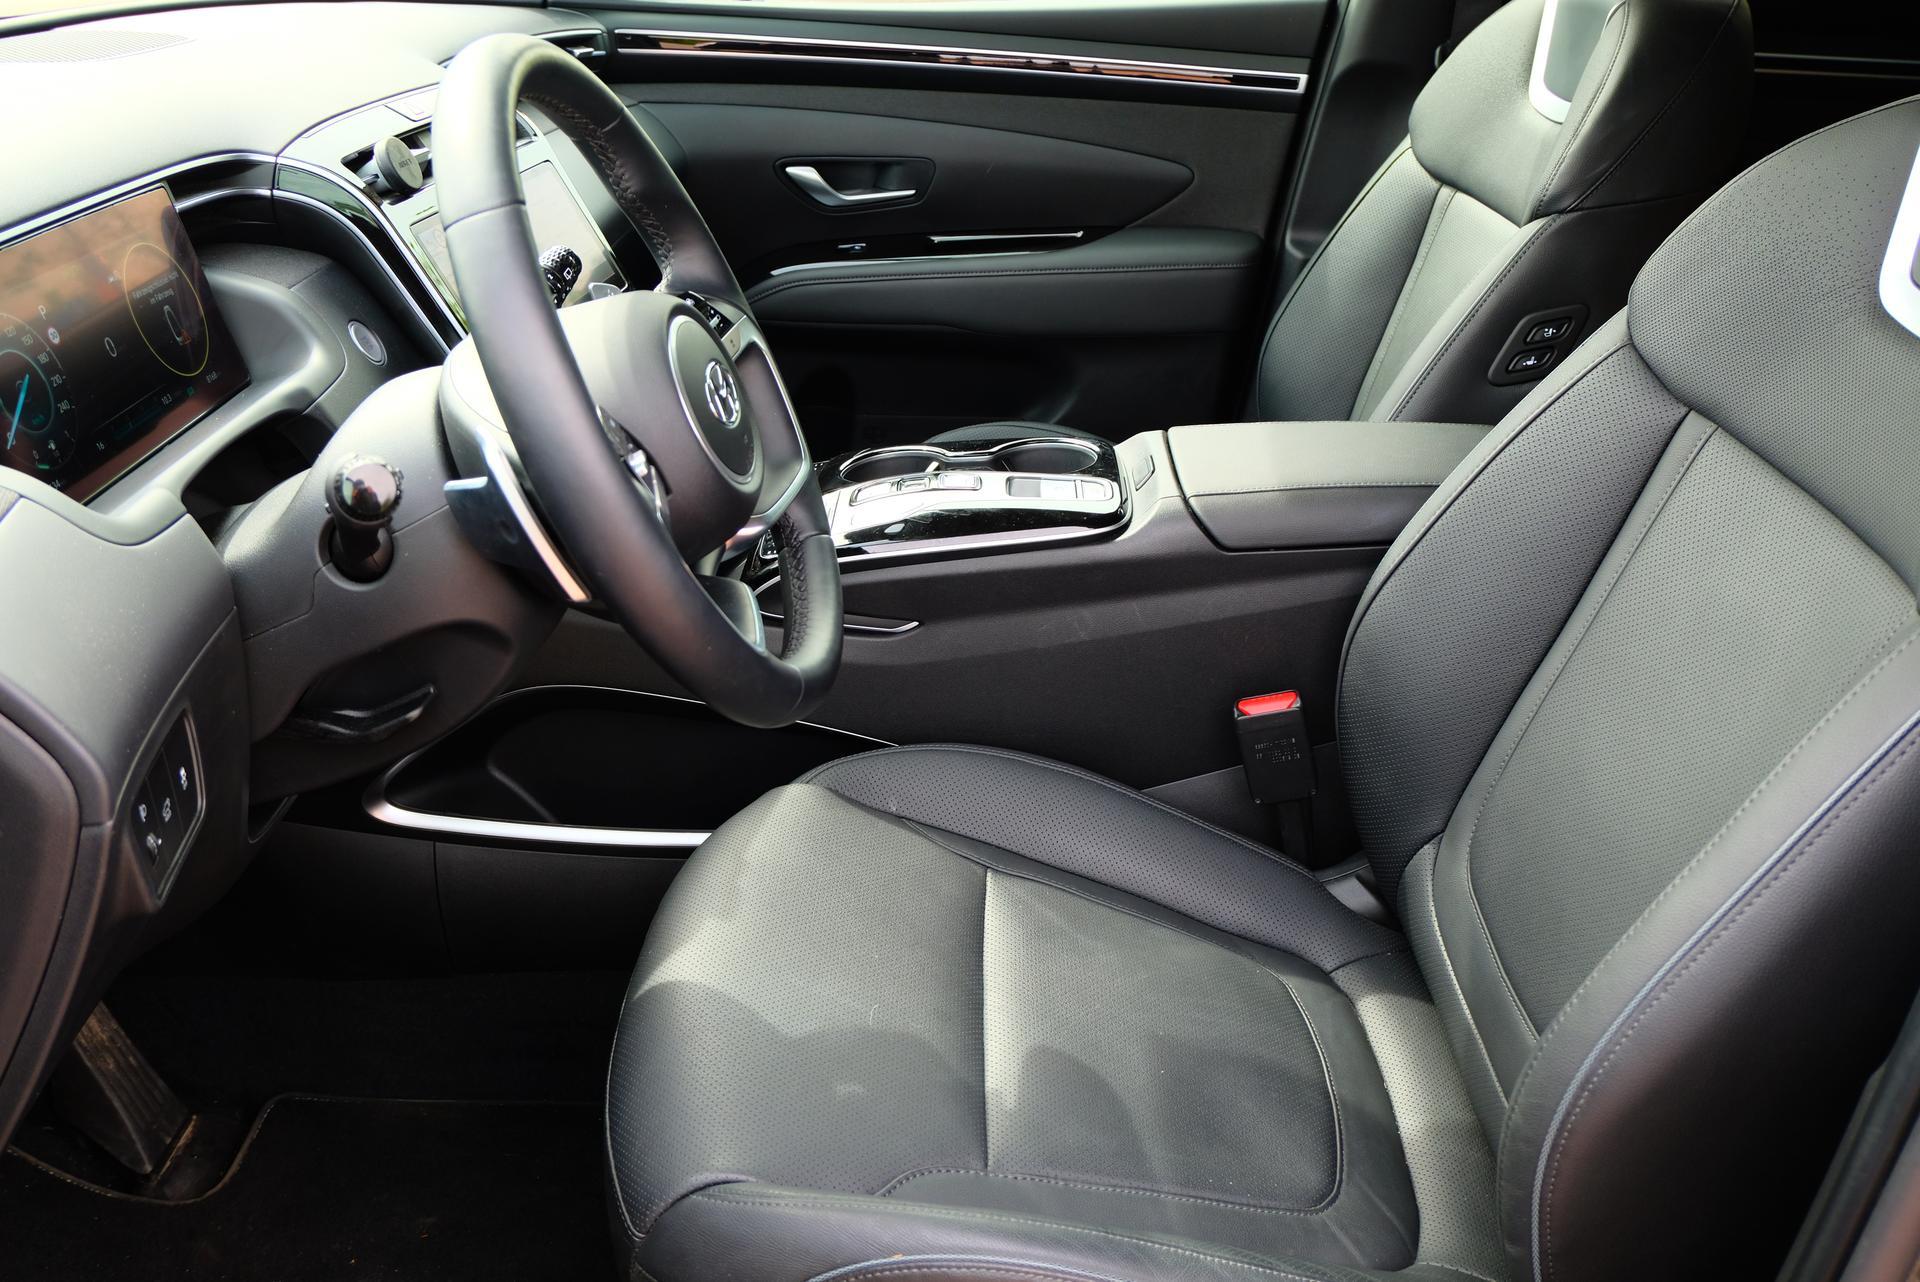 Hyundai Tucson 1.6 T-GDI HEV 4x4 Fahrersitz